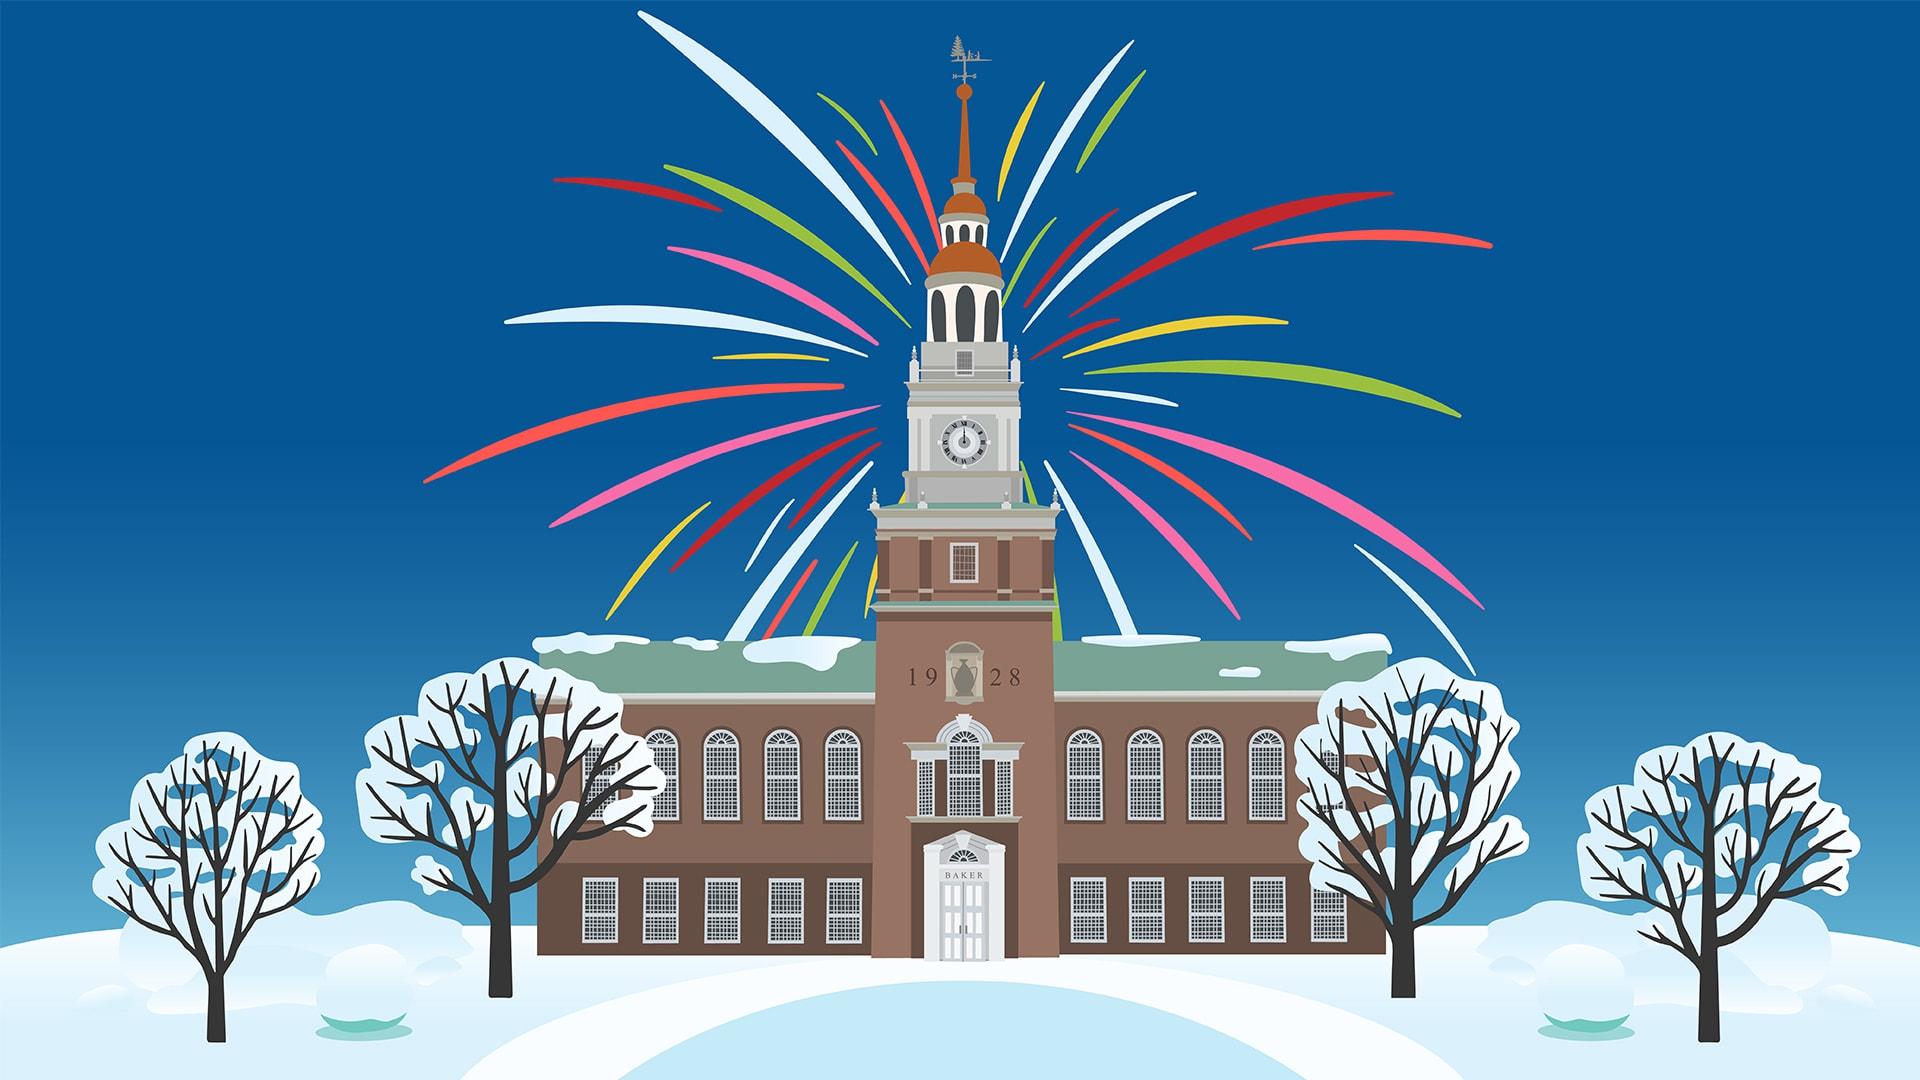 Dartmouth Happy New Year Animation